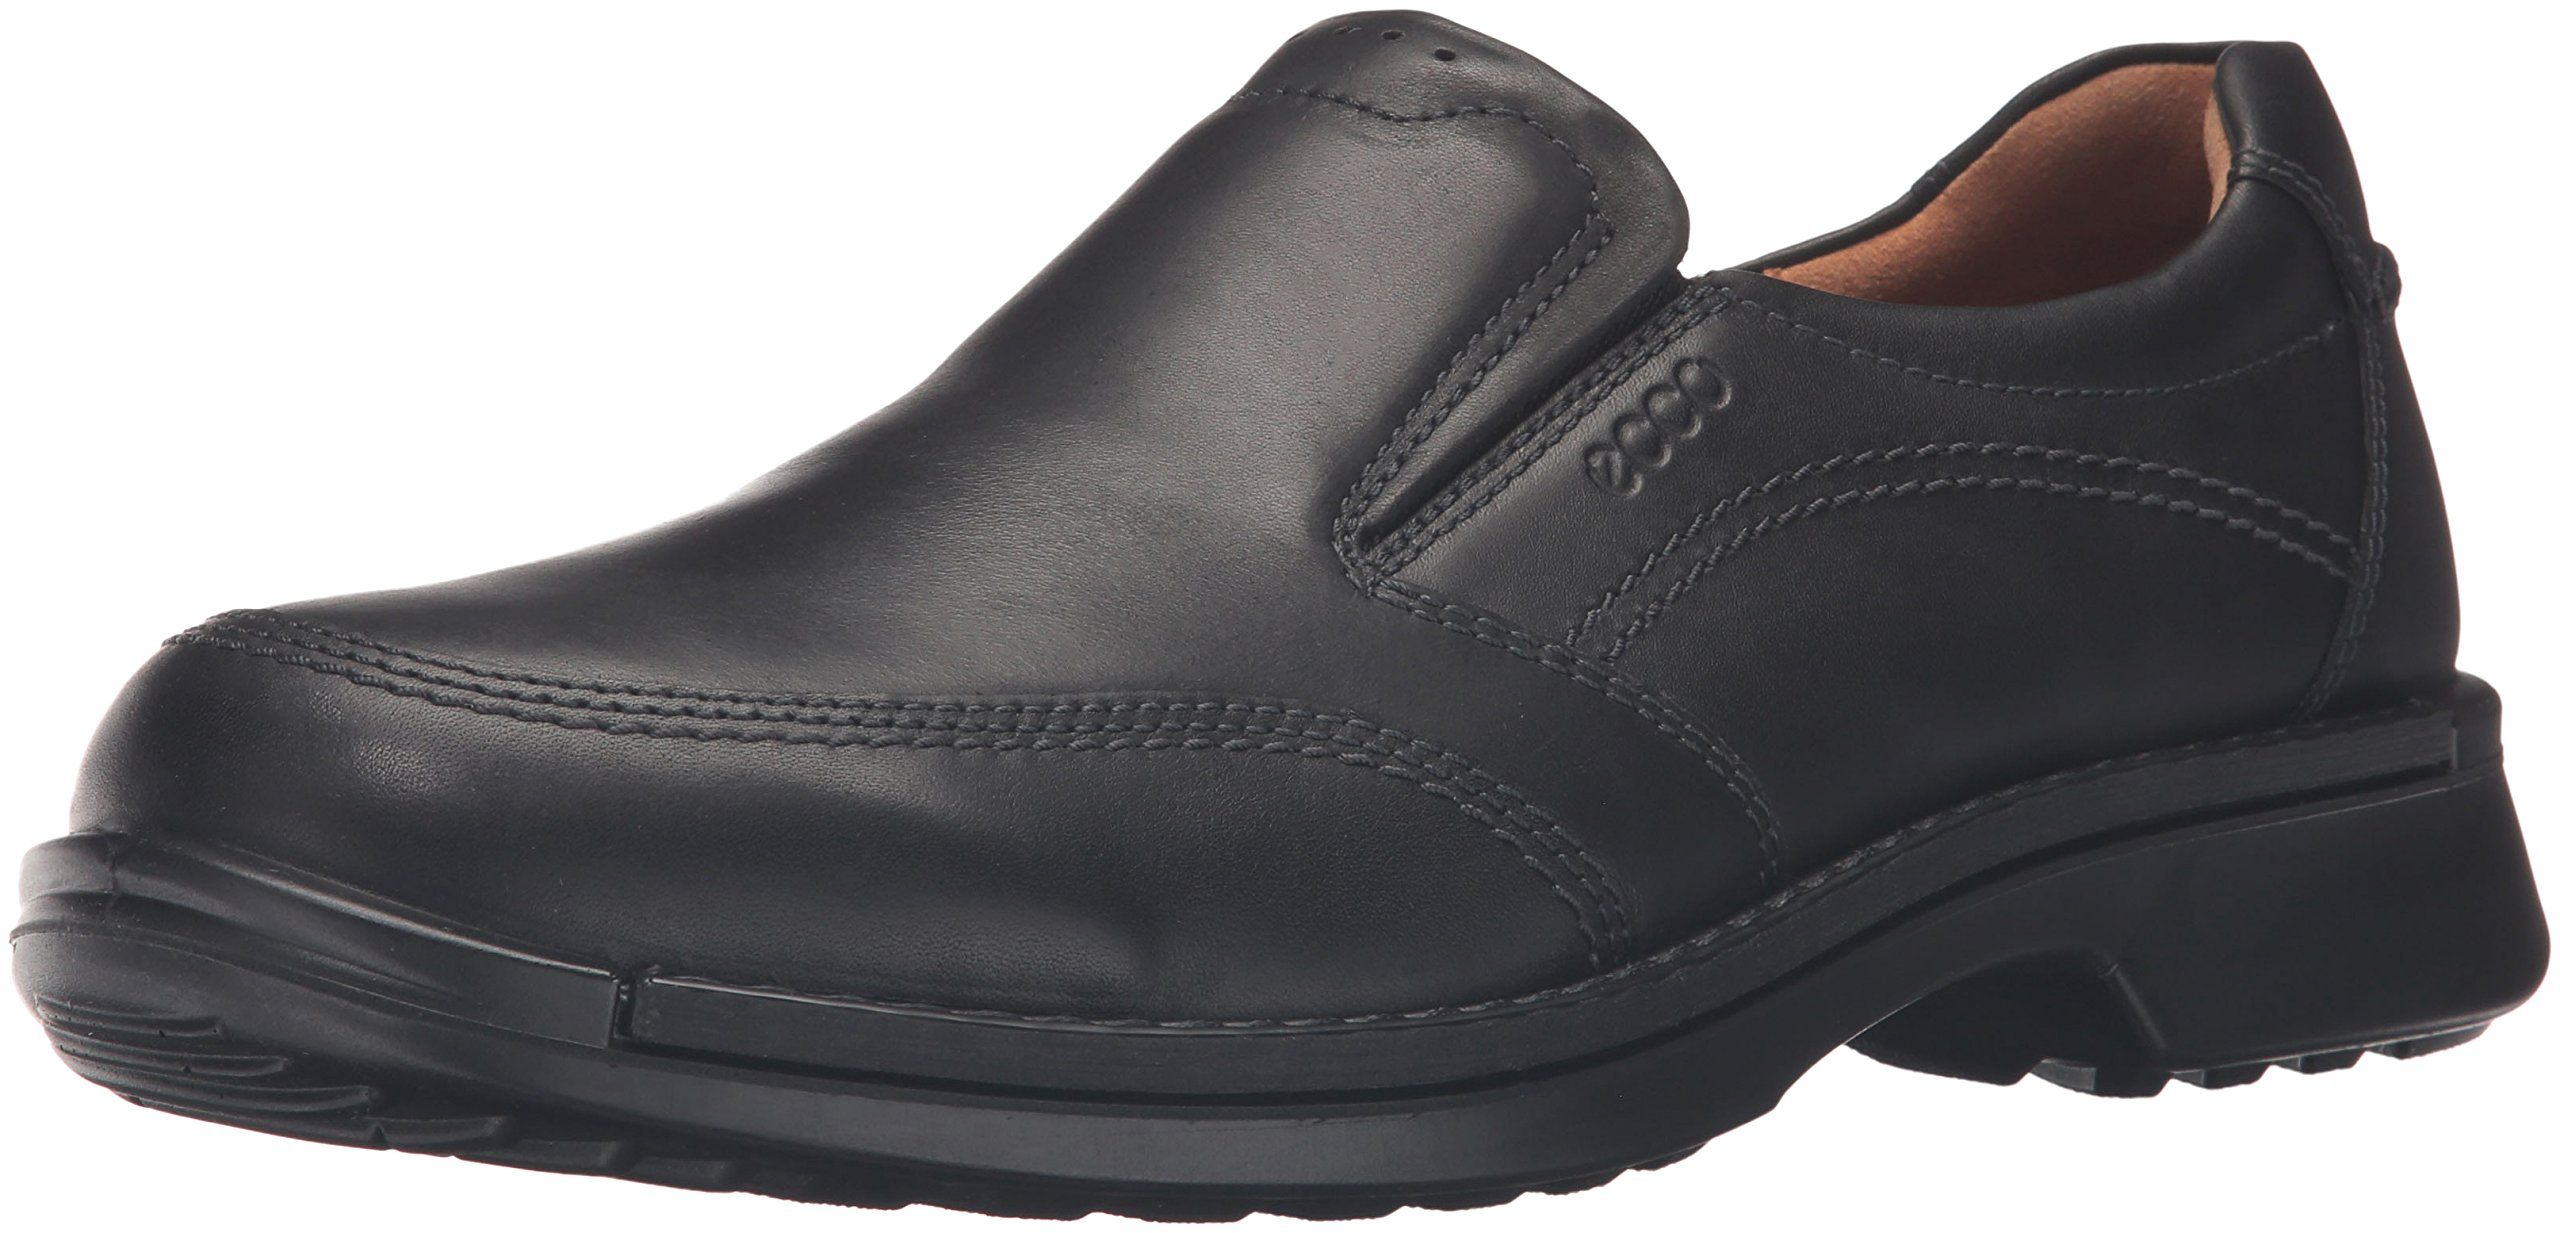 ECCO Men's Fusion II Slip On Casual Loafer Slip-On, Black, 44 EU/10-10.5 M US